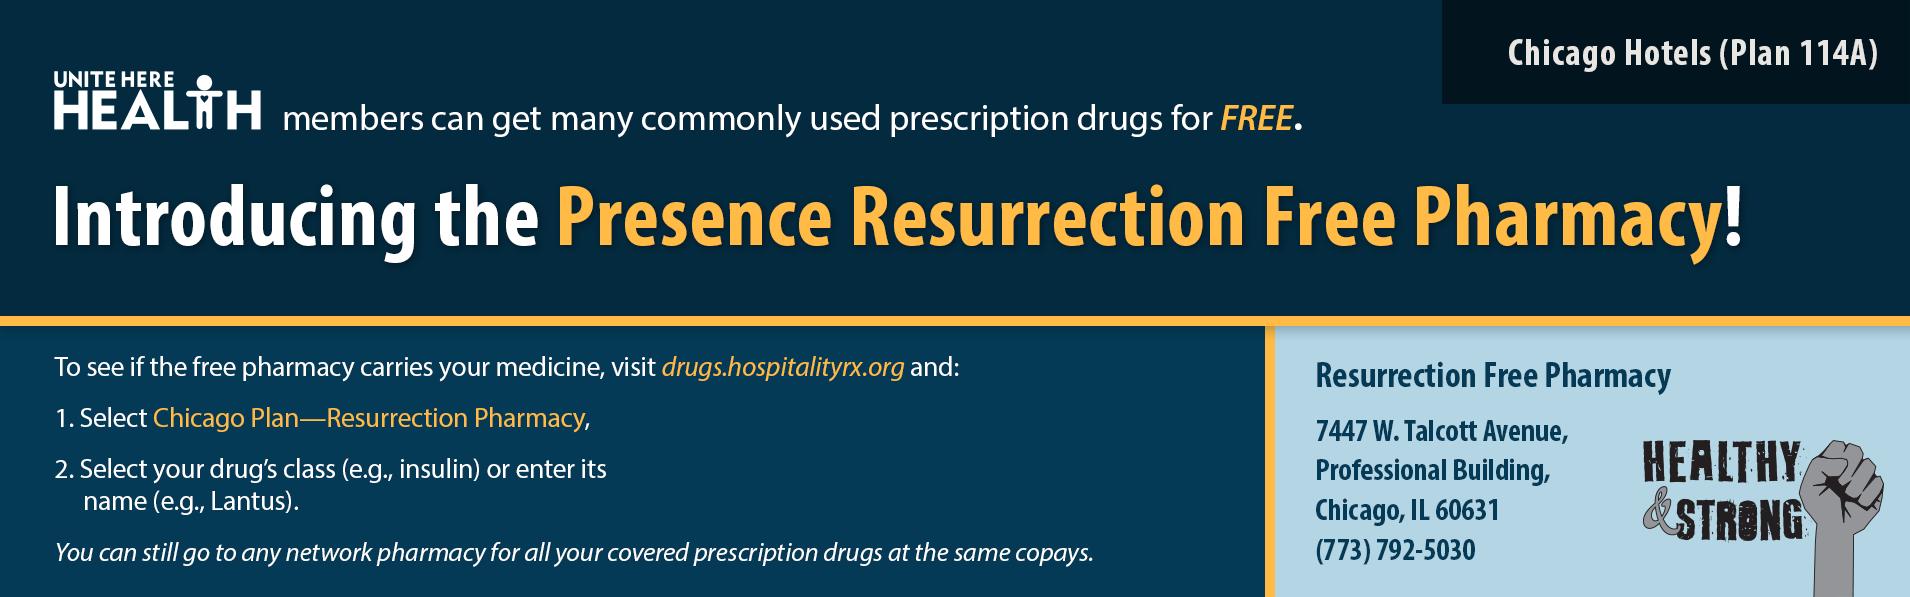 Presence Resurrection Free Pharmacy